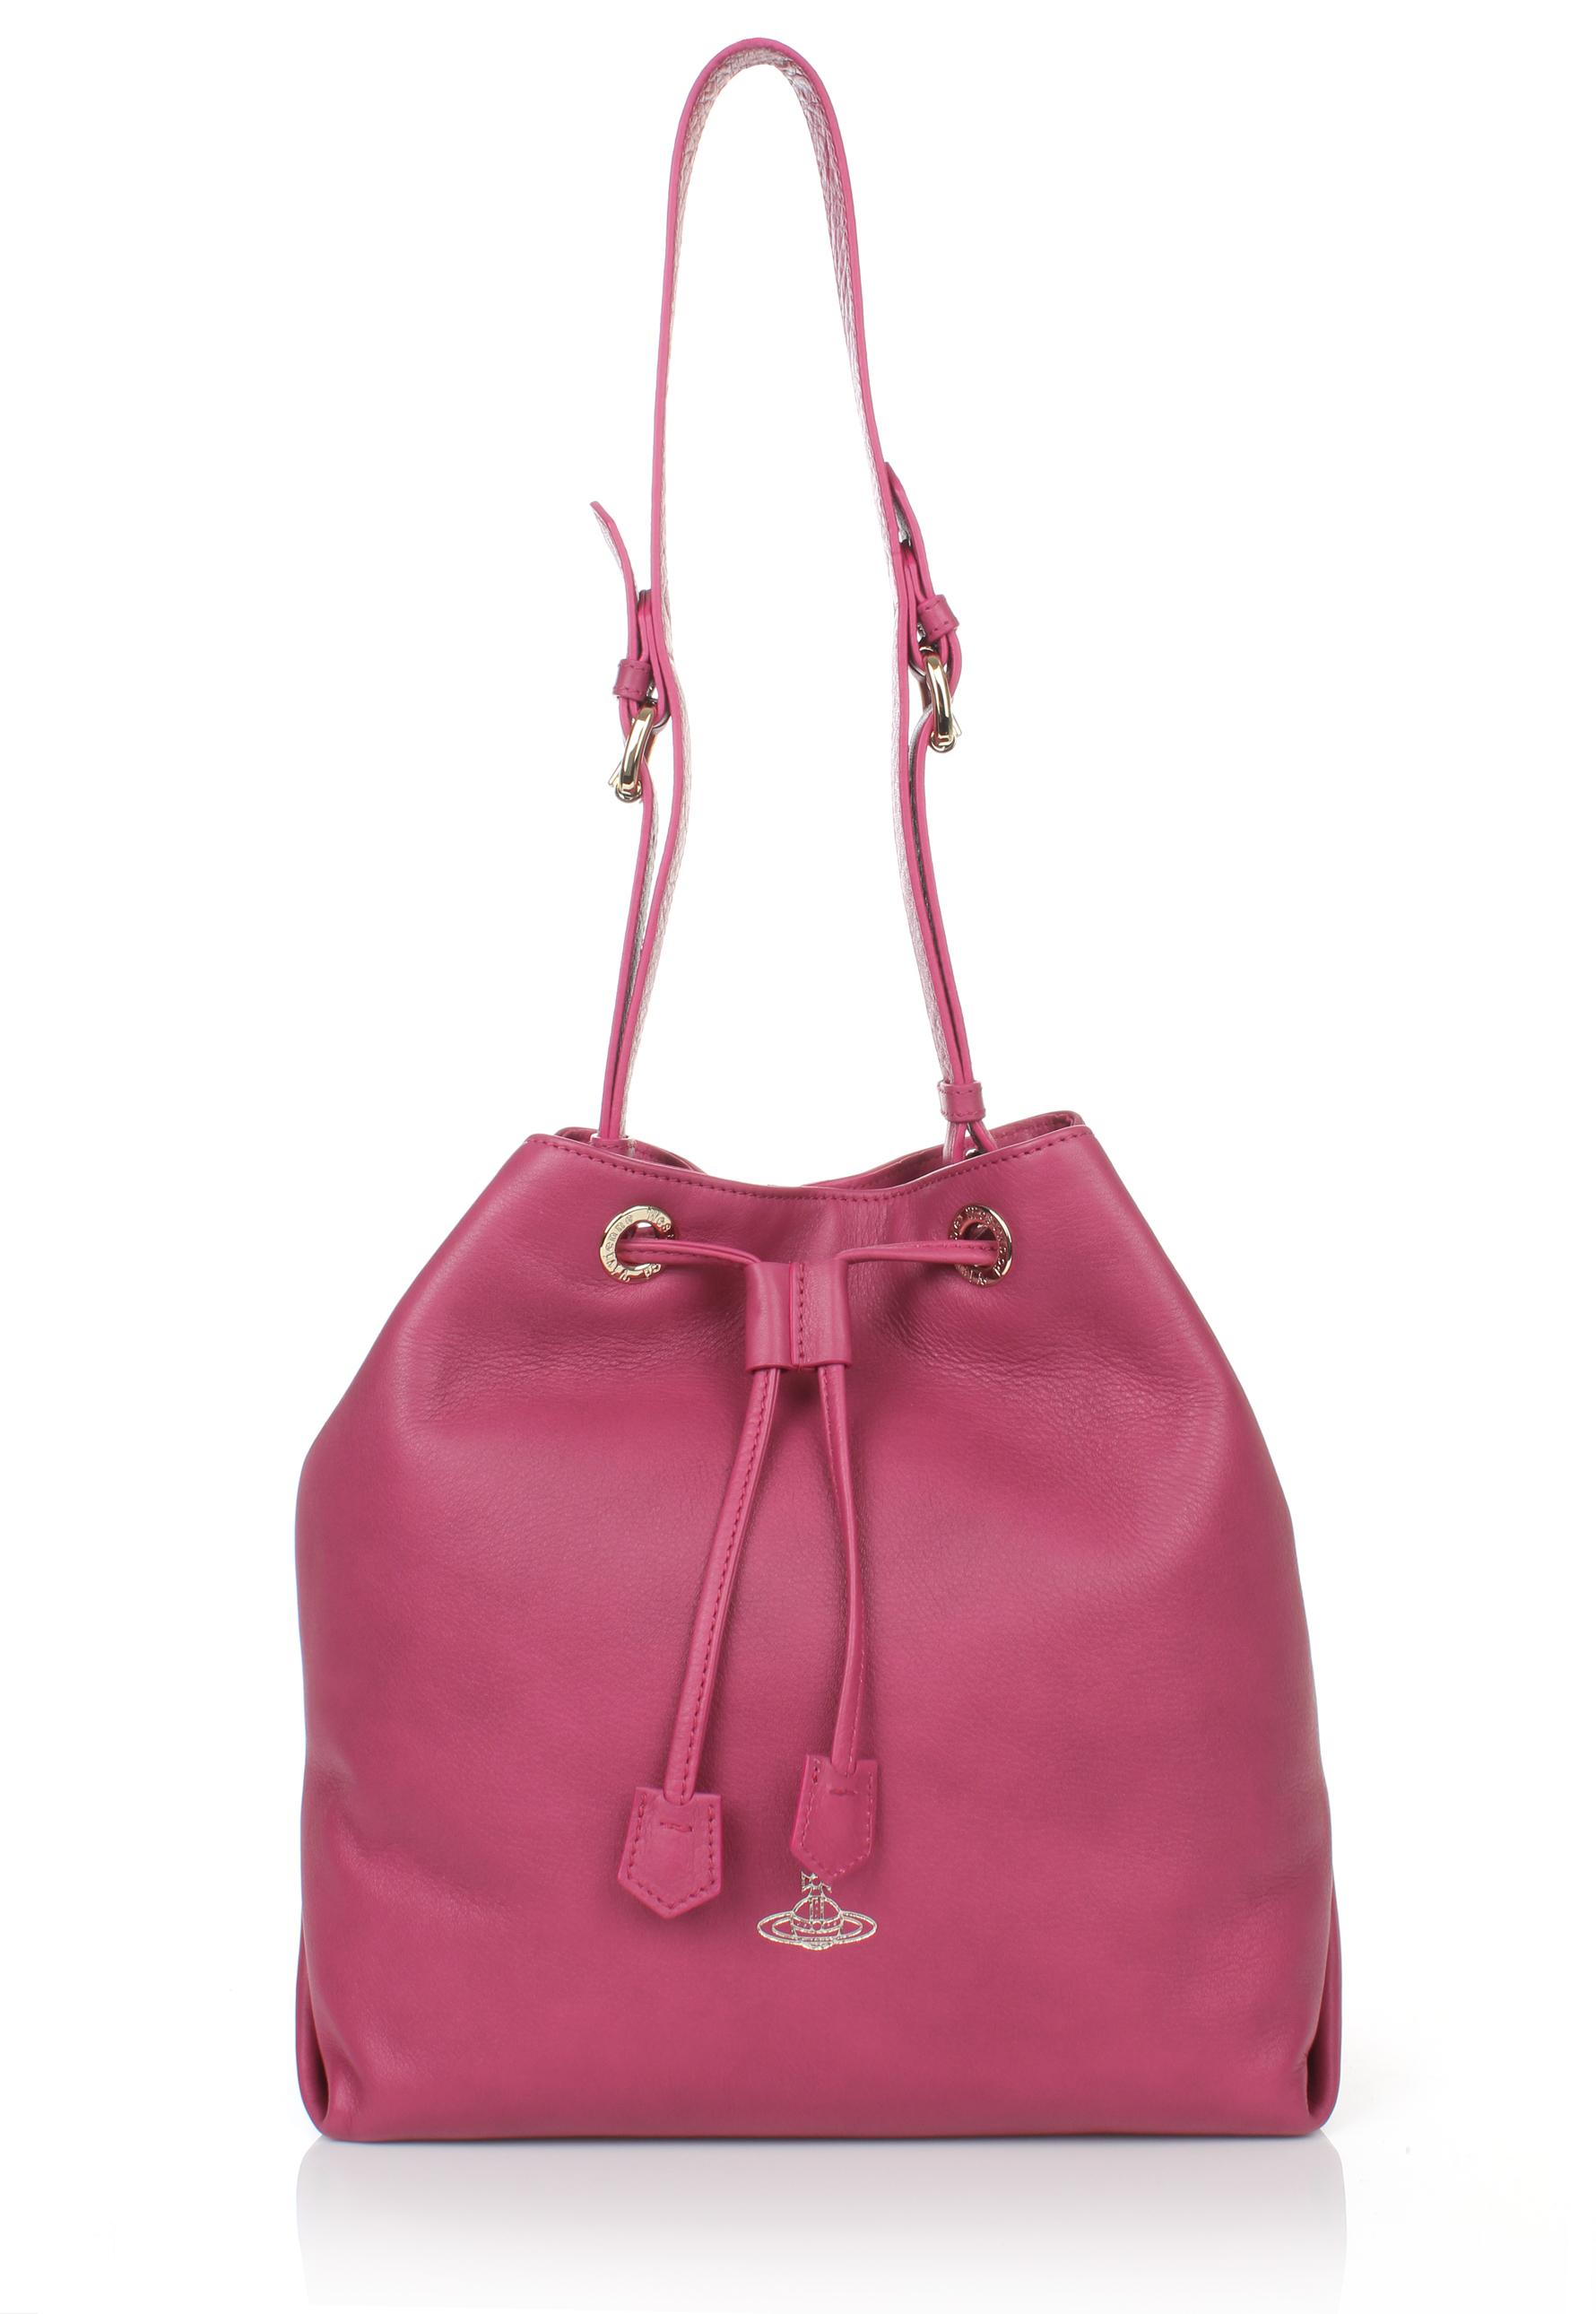 bb76b71ebc15 Vivienne Westwood Spencer 13821 Bucket Bag Fuchsia in Purple - Lyst